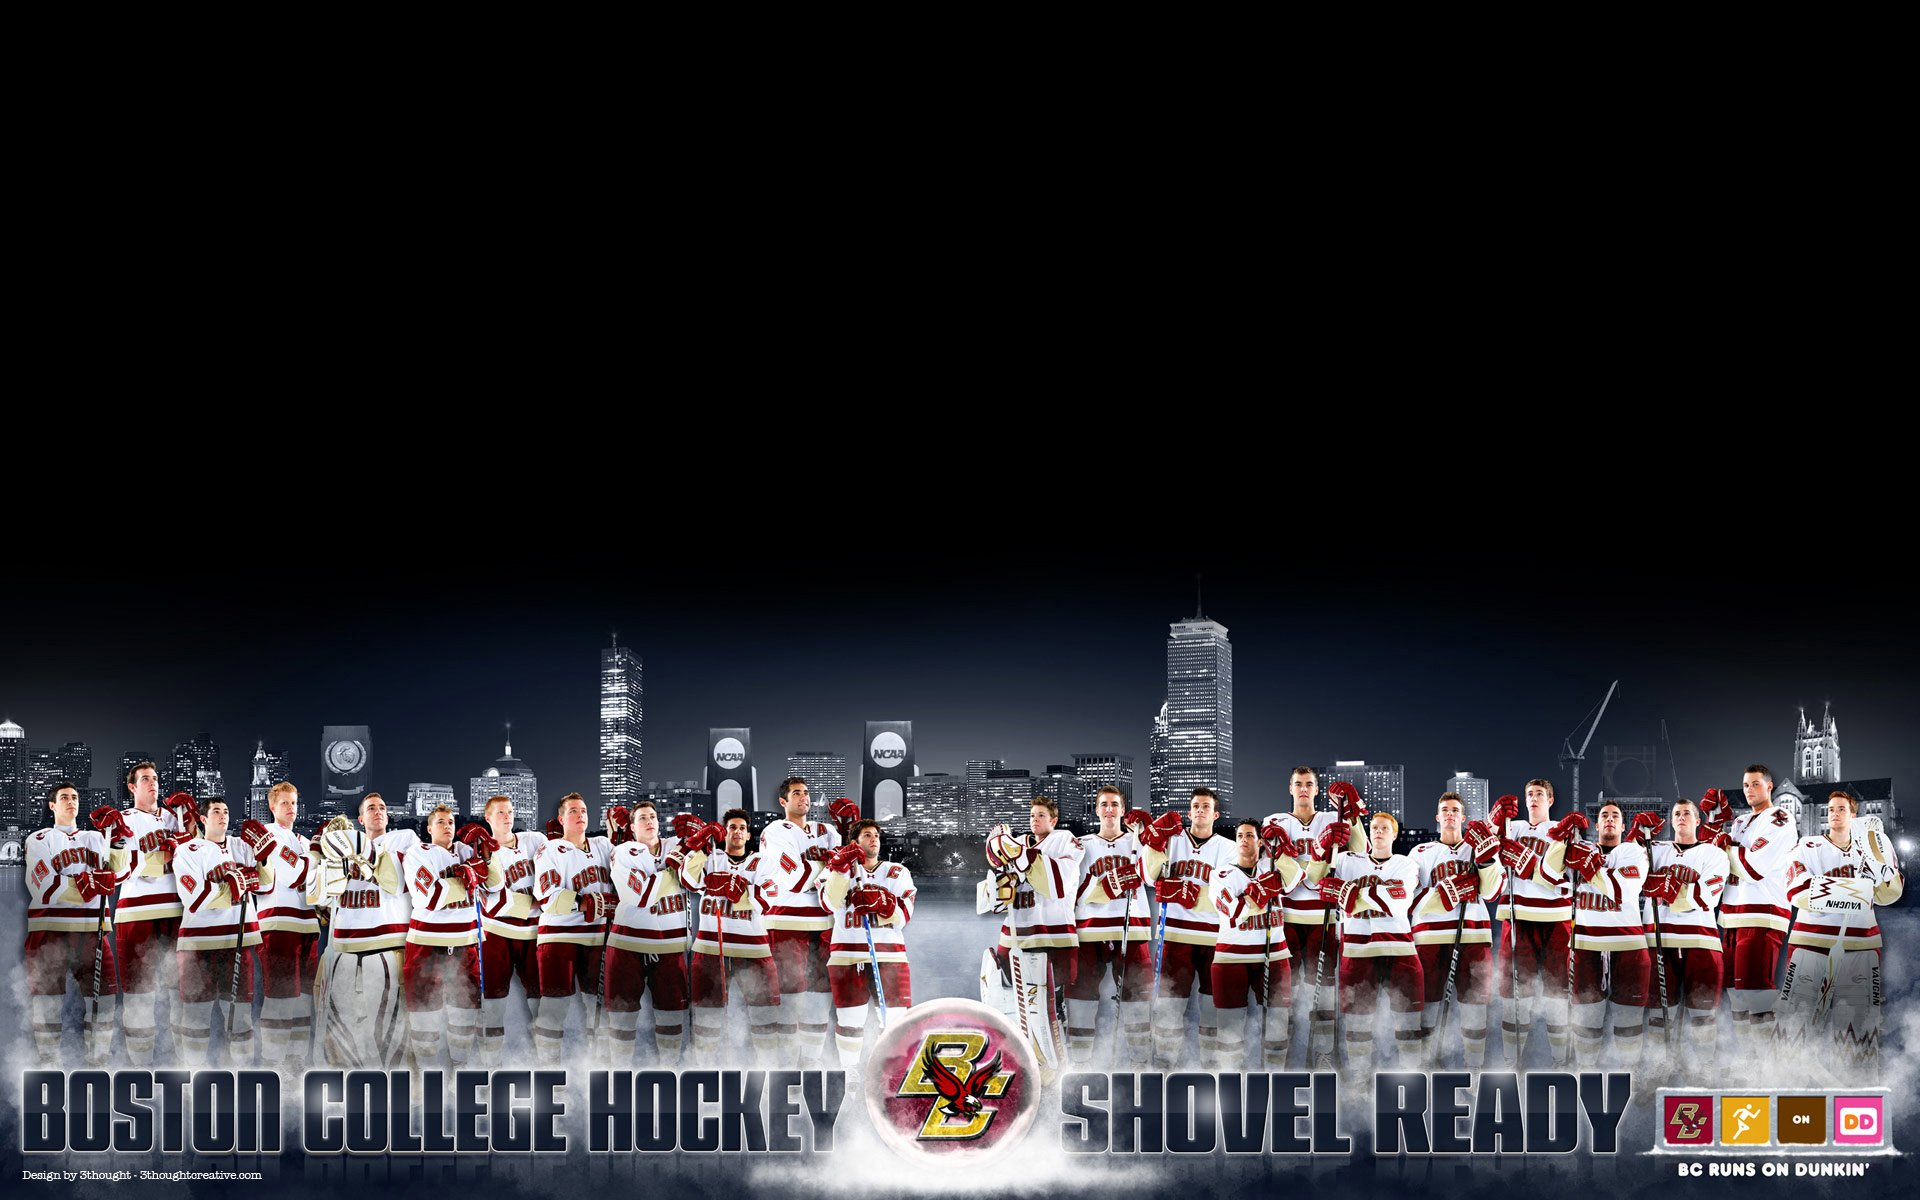 Boston College Hockey wallpaper   240898 1920x1200